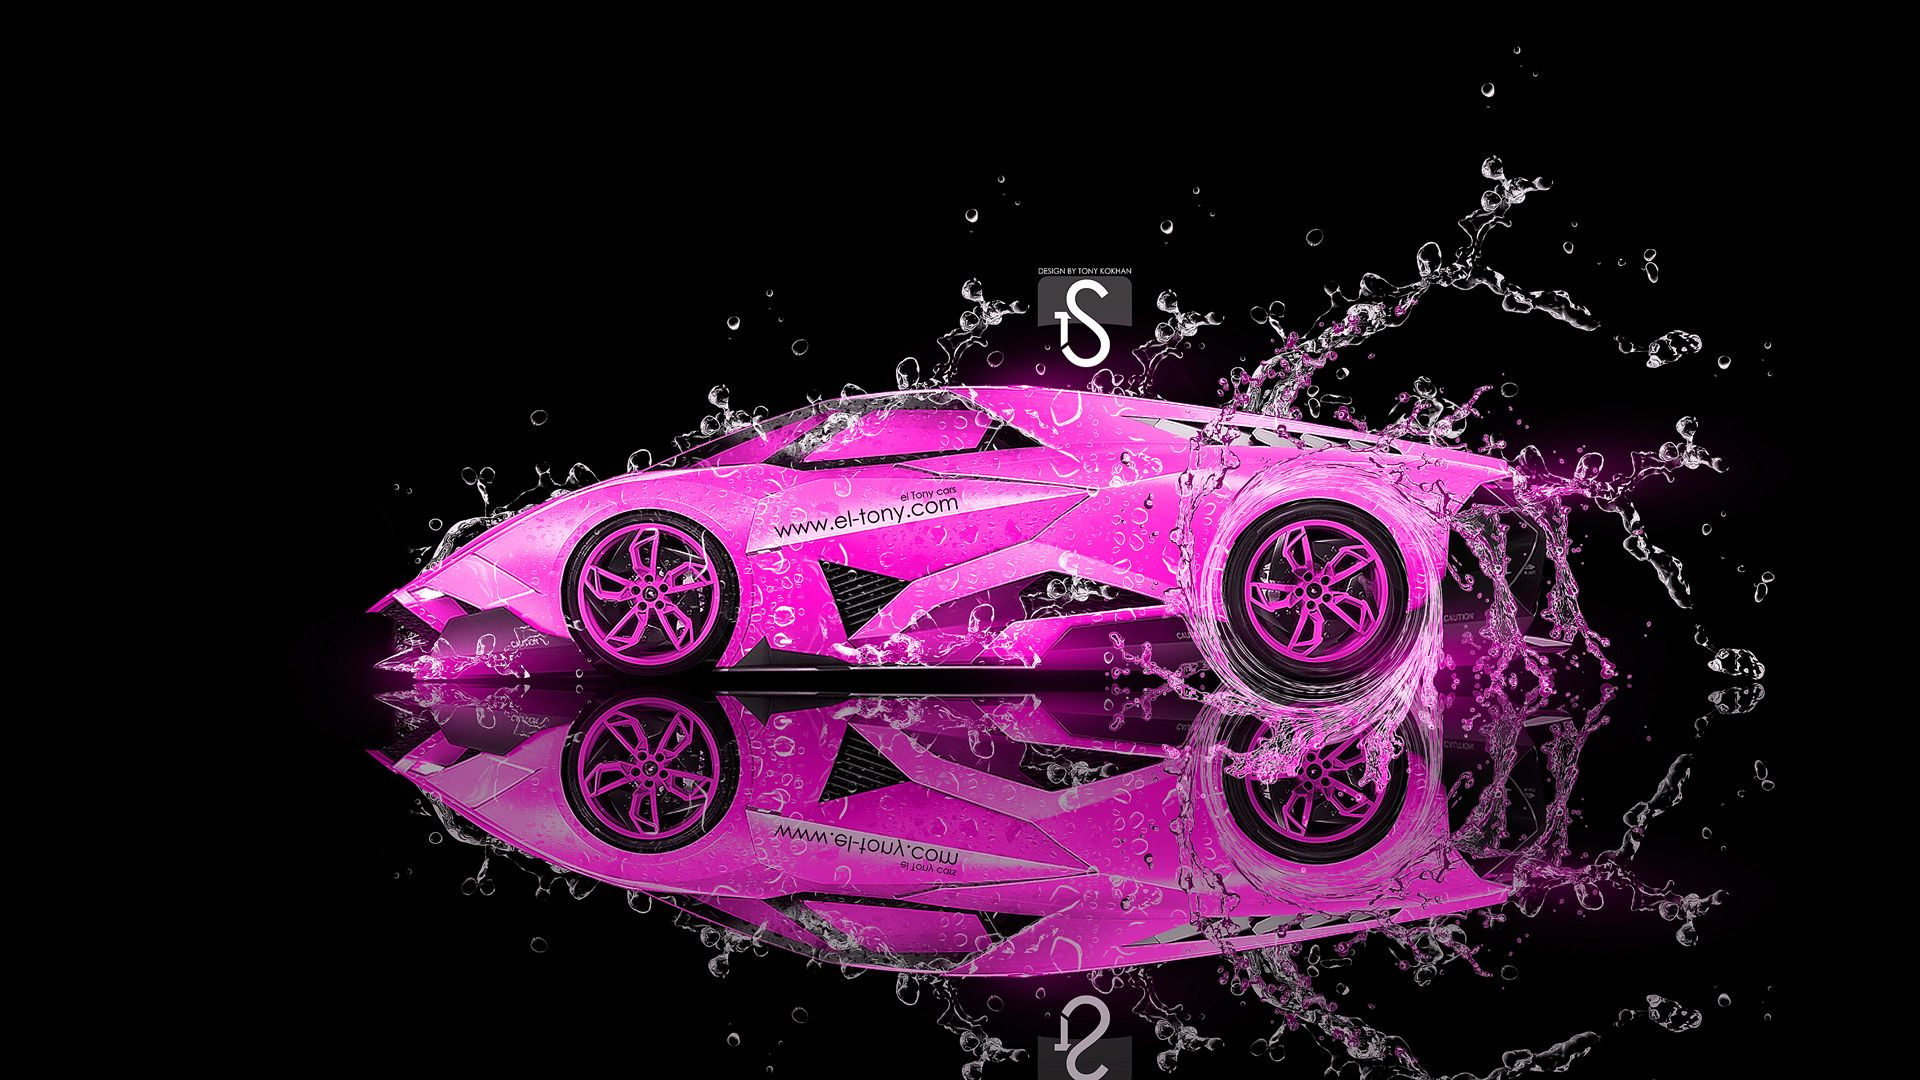 Lamborghini Egoista Pink Bad Cars Trucks Motorcycles